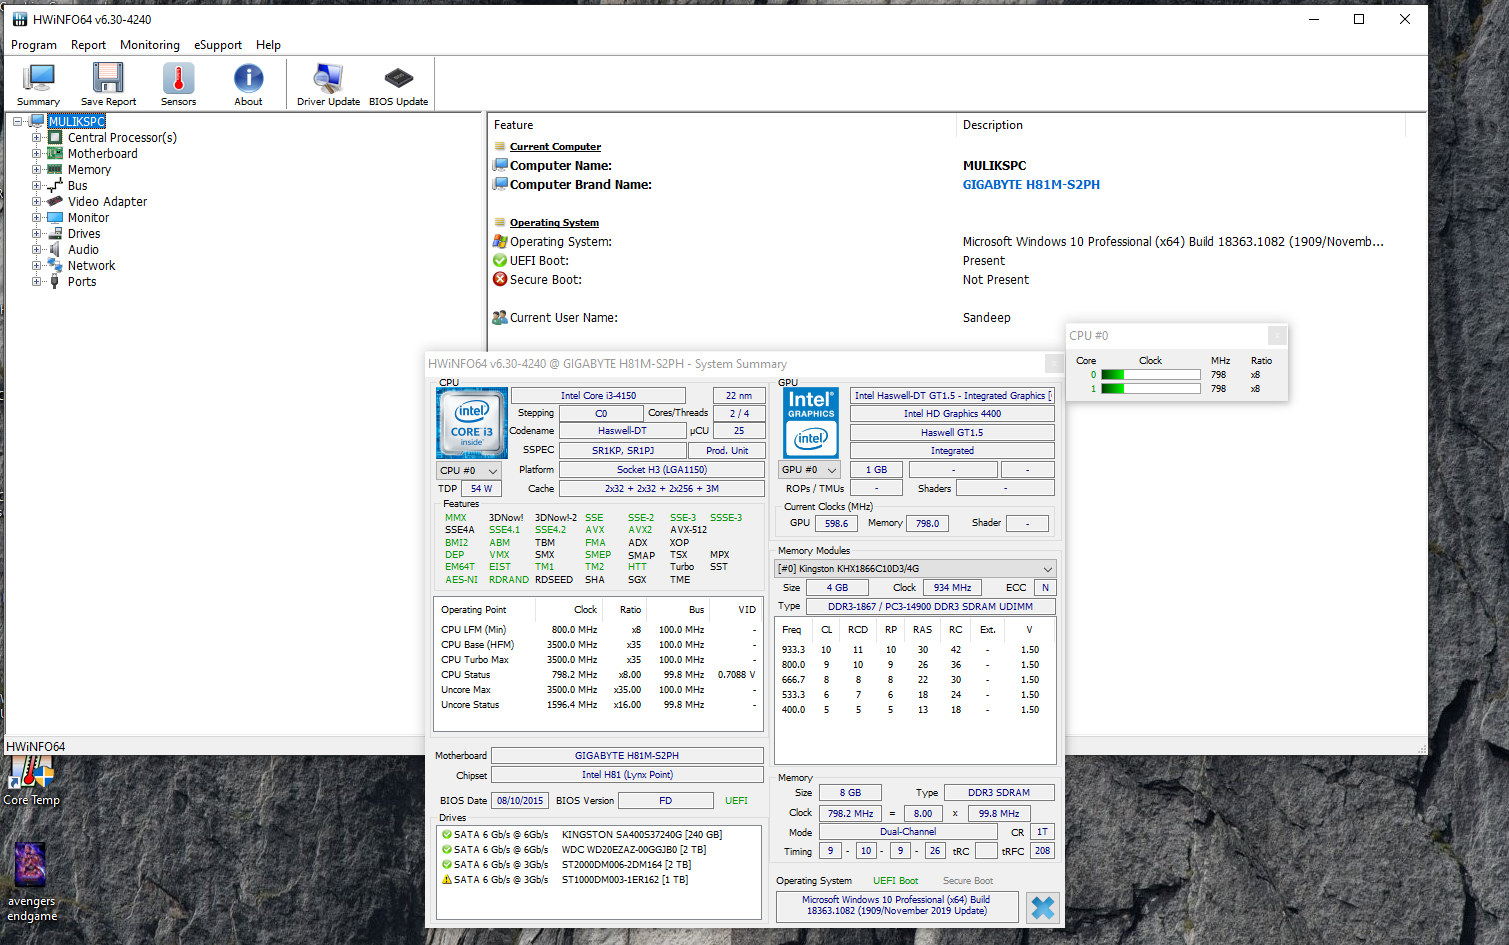 Screenshot 2020-09-11 230945.png